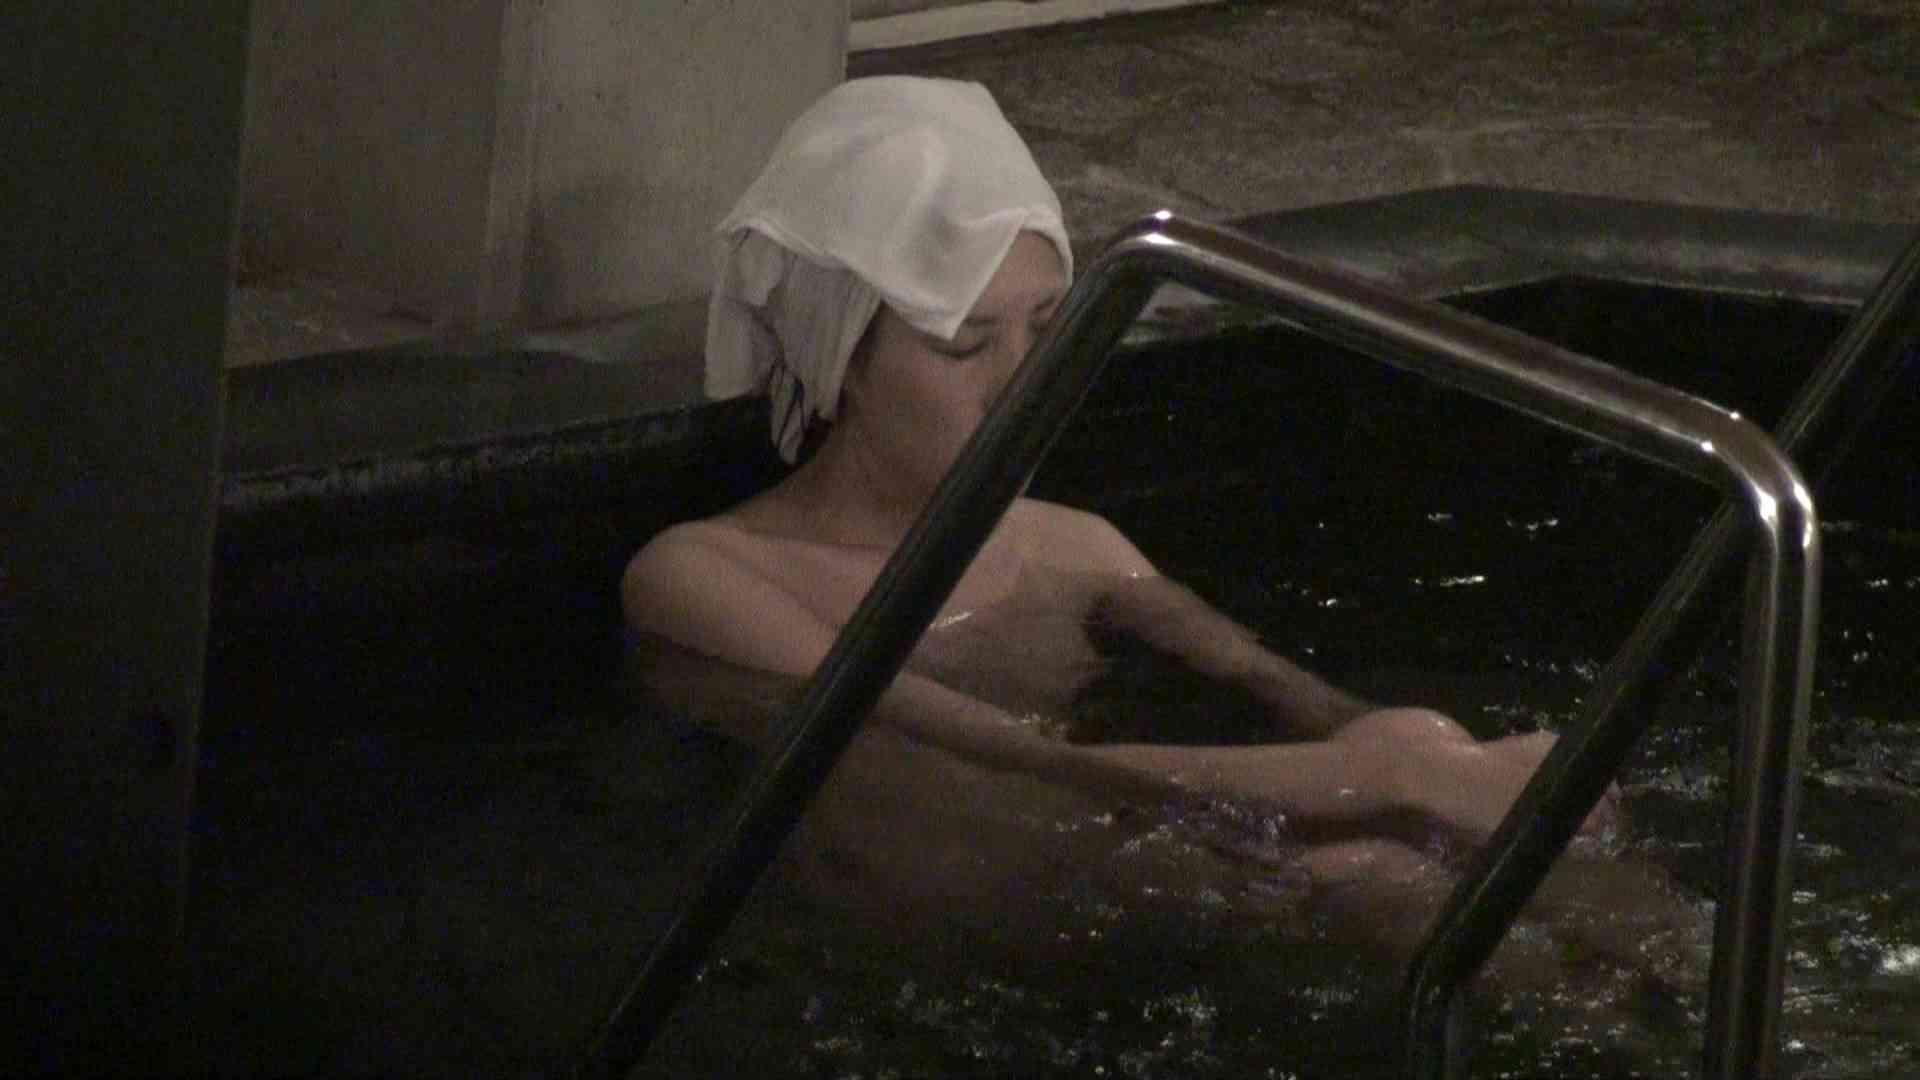 Aquaな露天風呂Vol.358 OLのエロ生活 おまんこ無修正動画無料 50連発 23